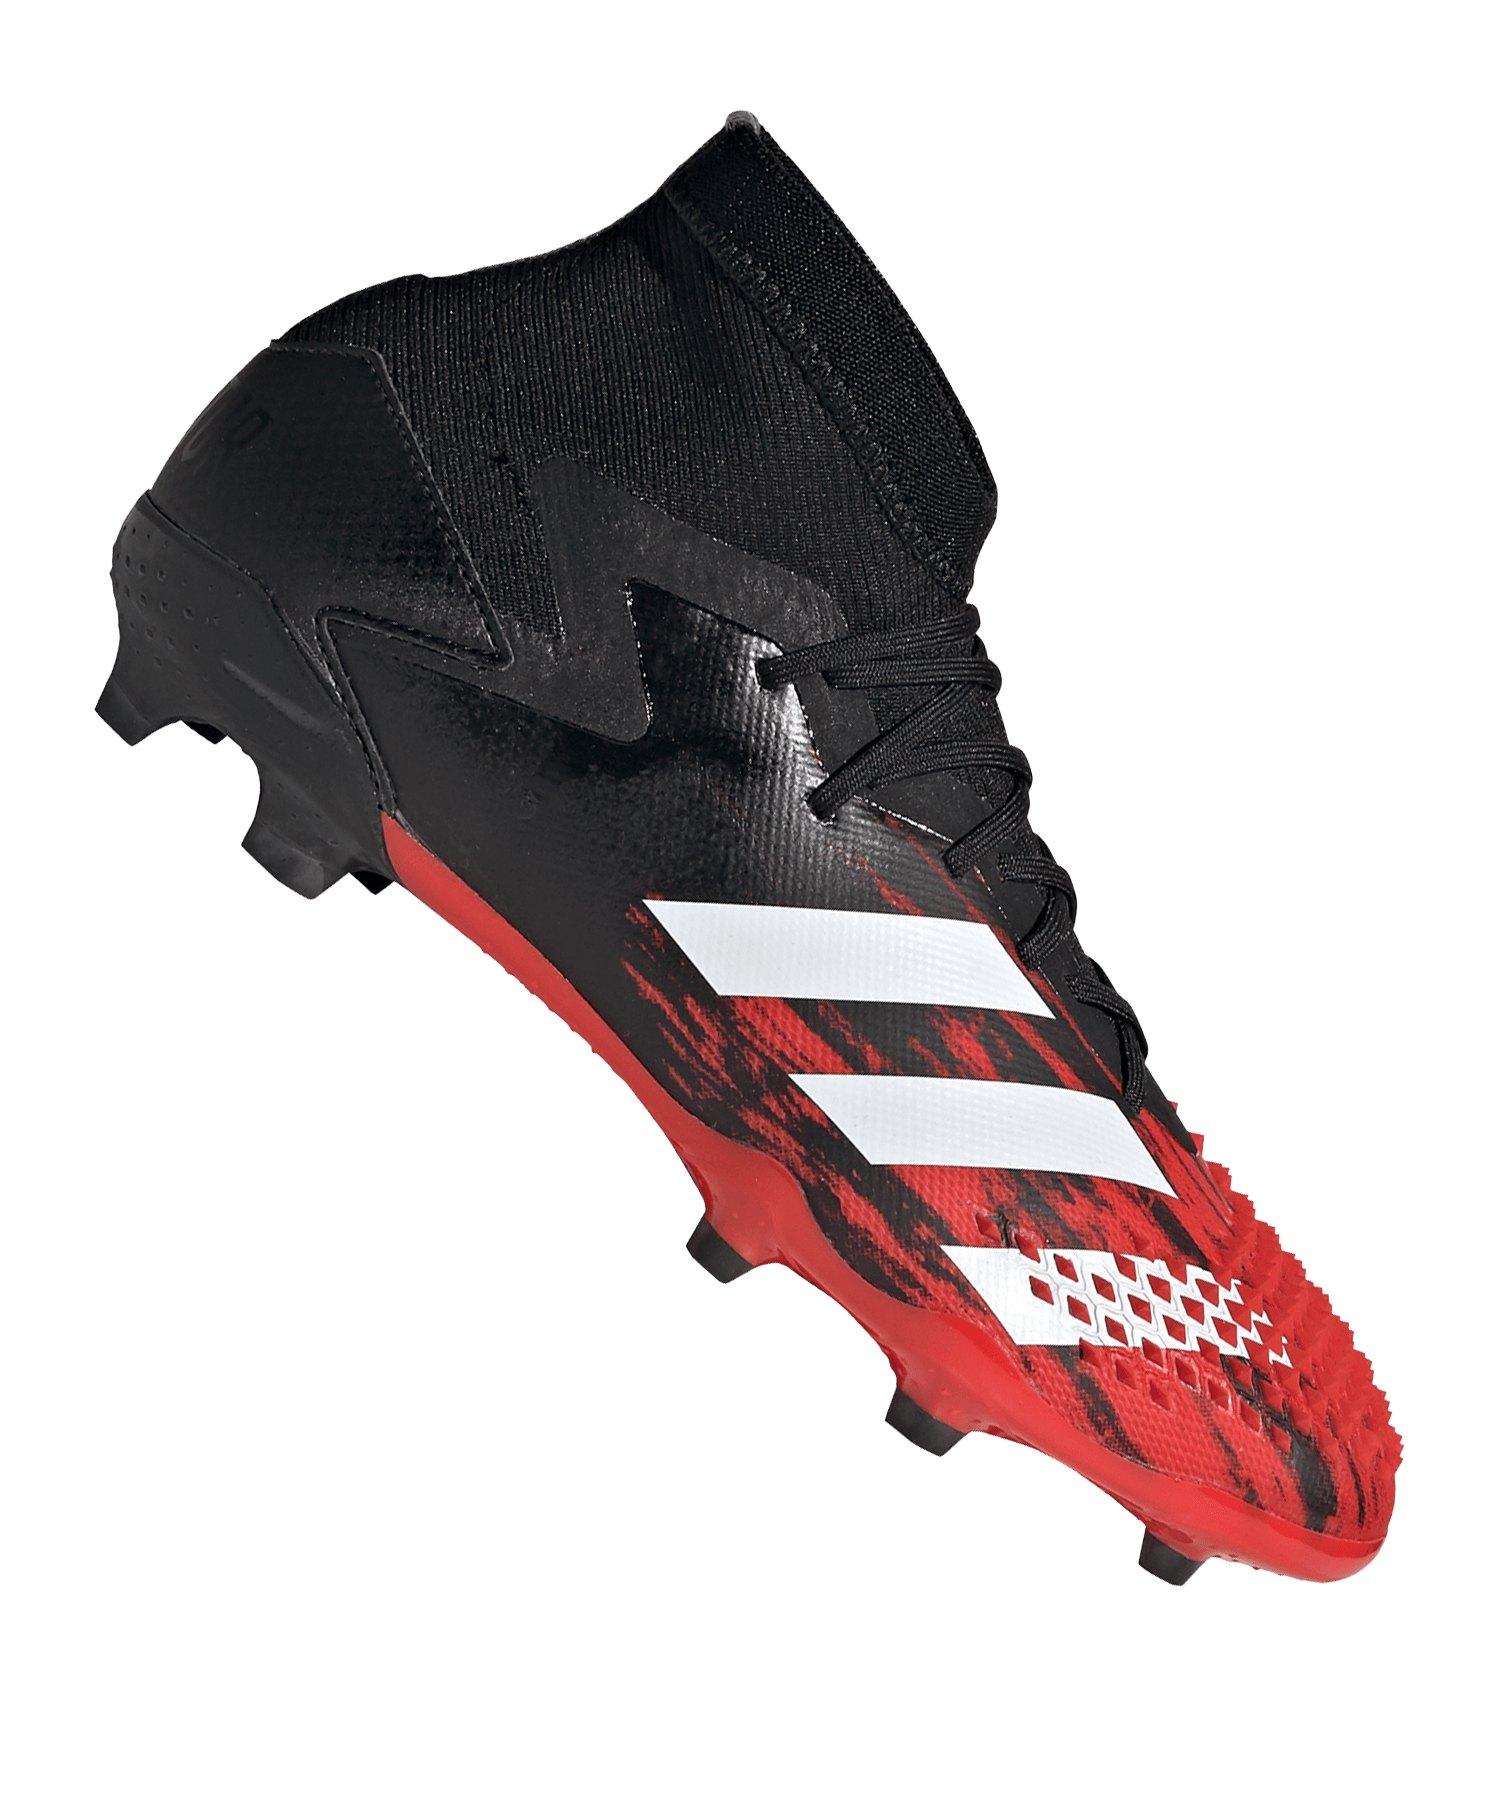 adidas Predator 20.1 FG J Kids Schwarz Rot - schwarz